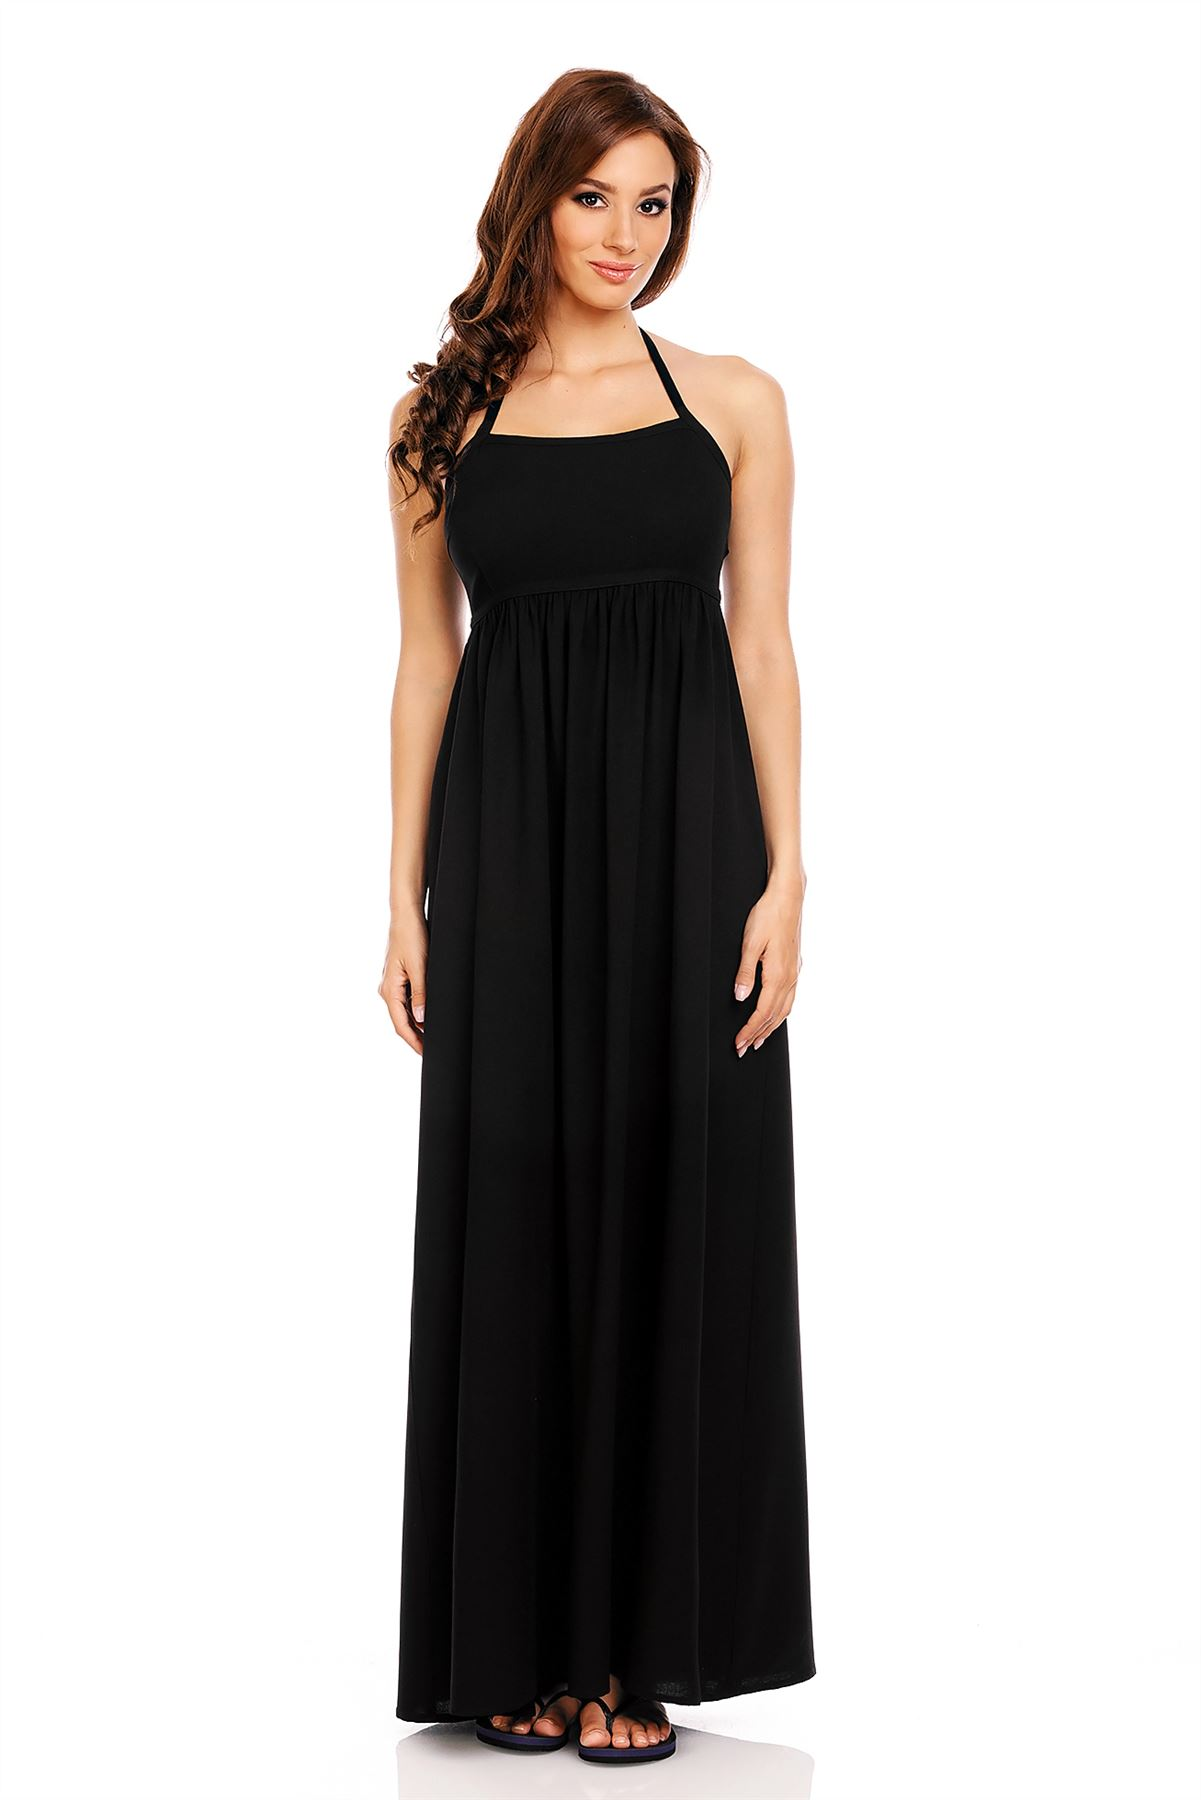 405d8678d52 Plus Size Long Dresses Uk - Data Dynamic AG